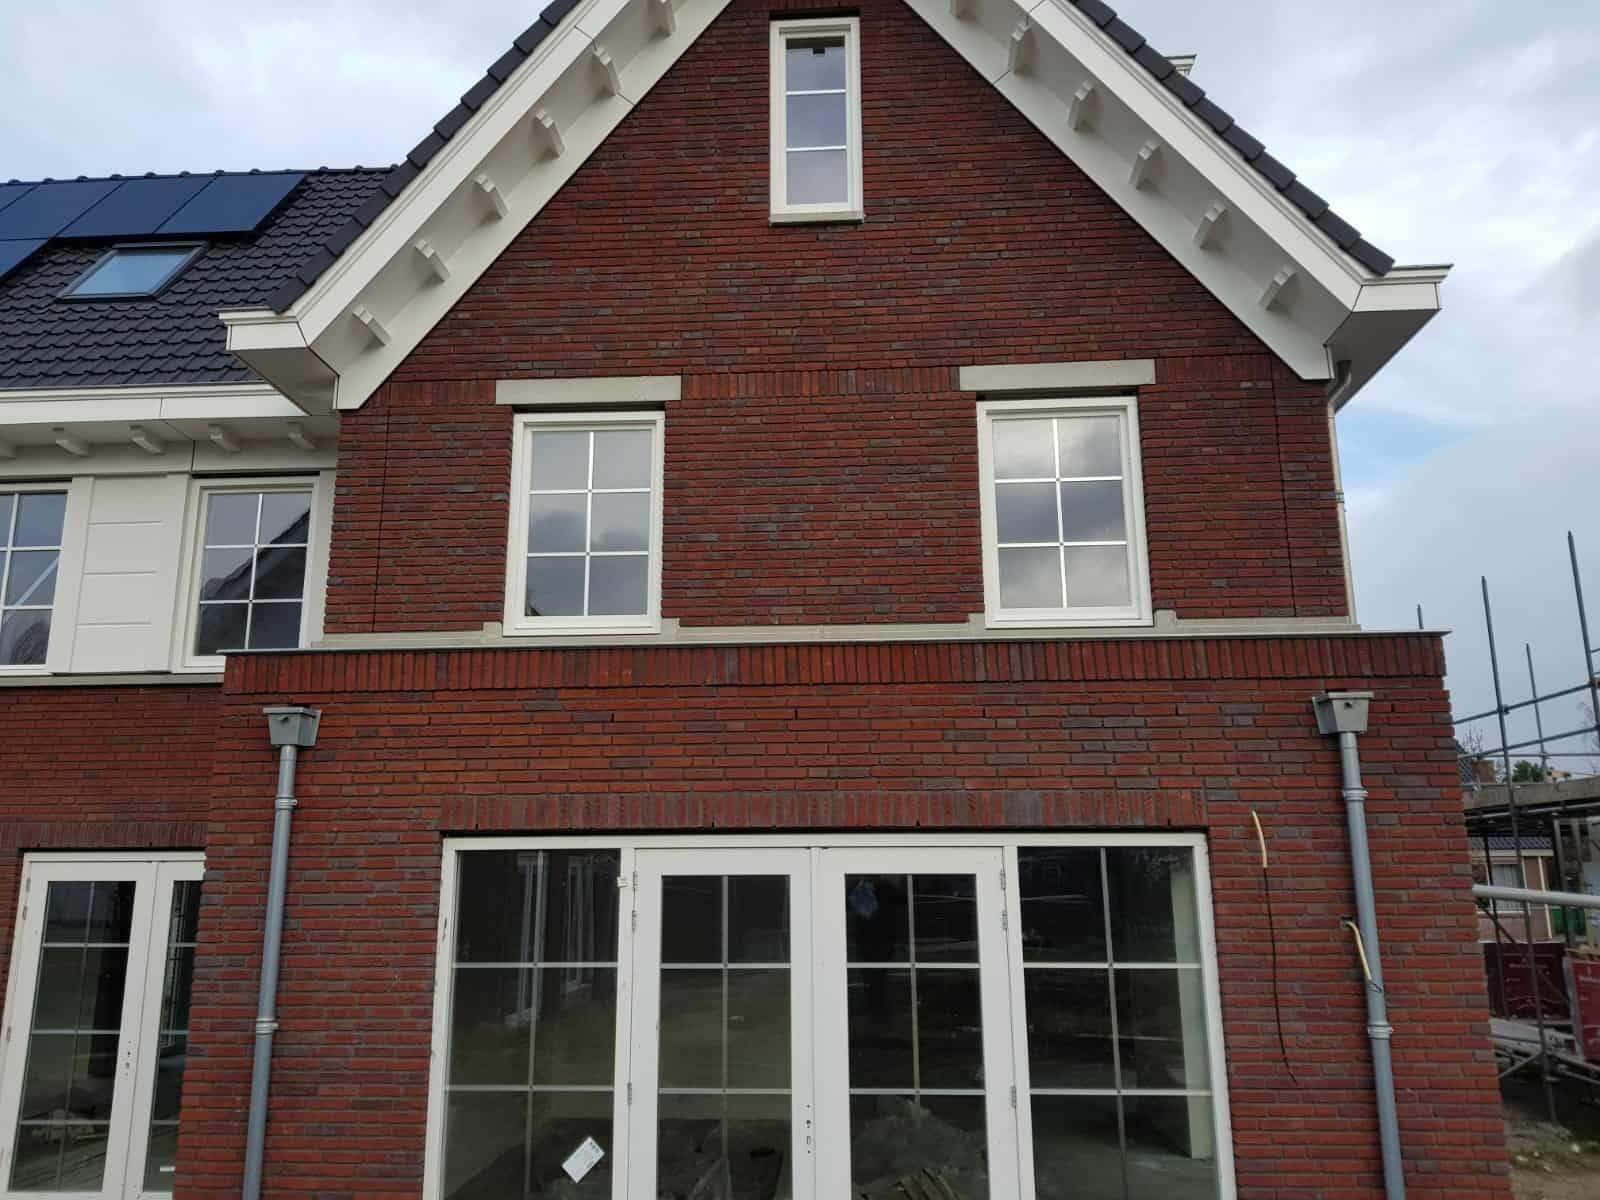 APM metselwerken Noordhof 5